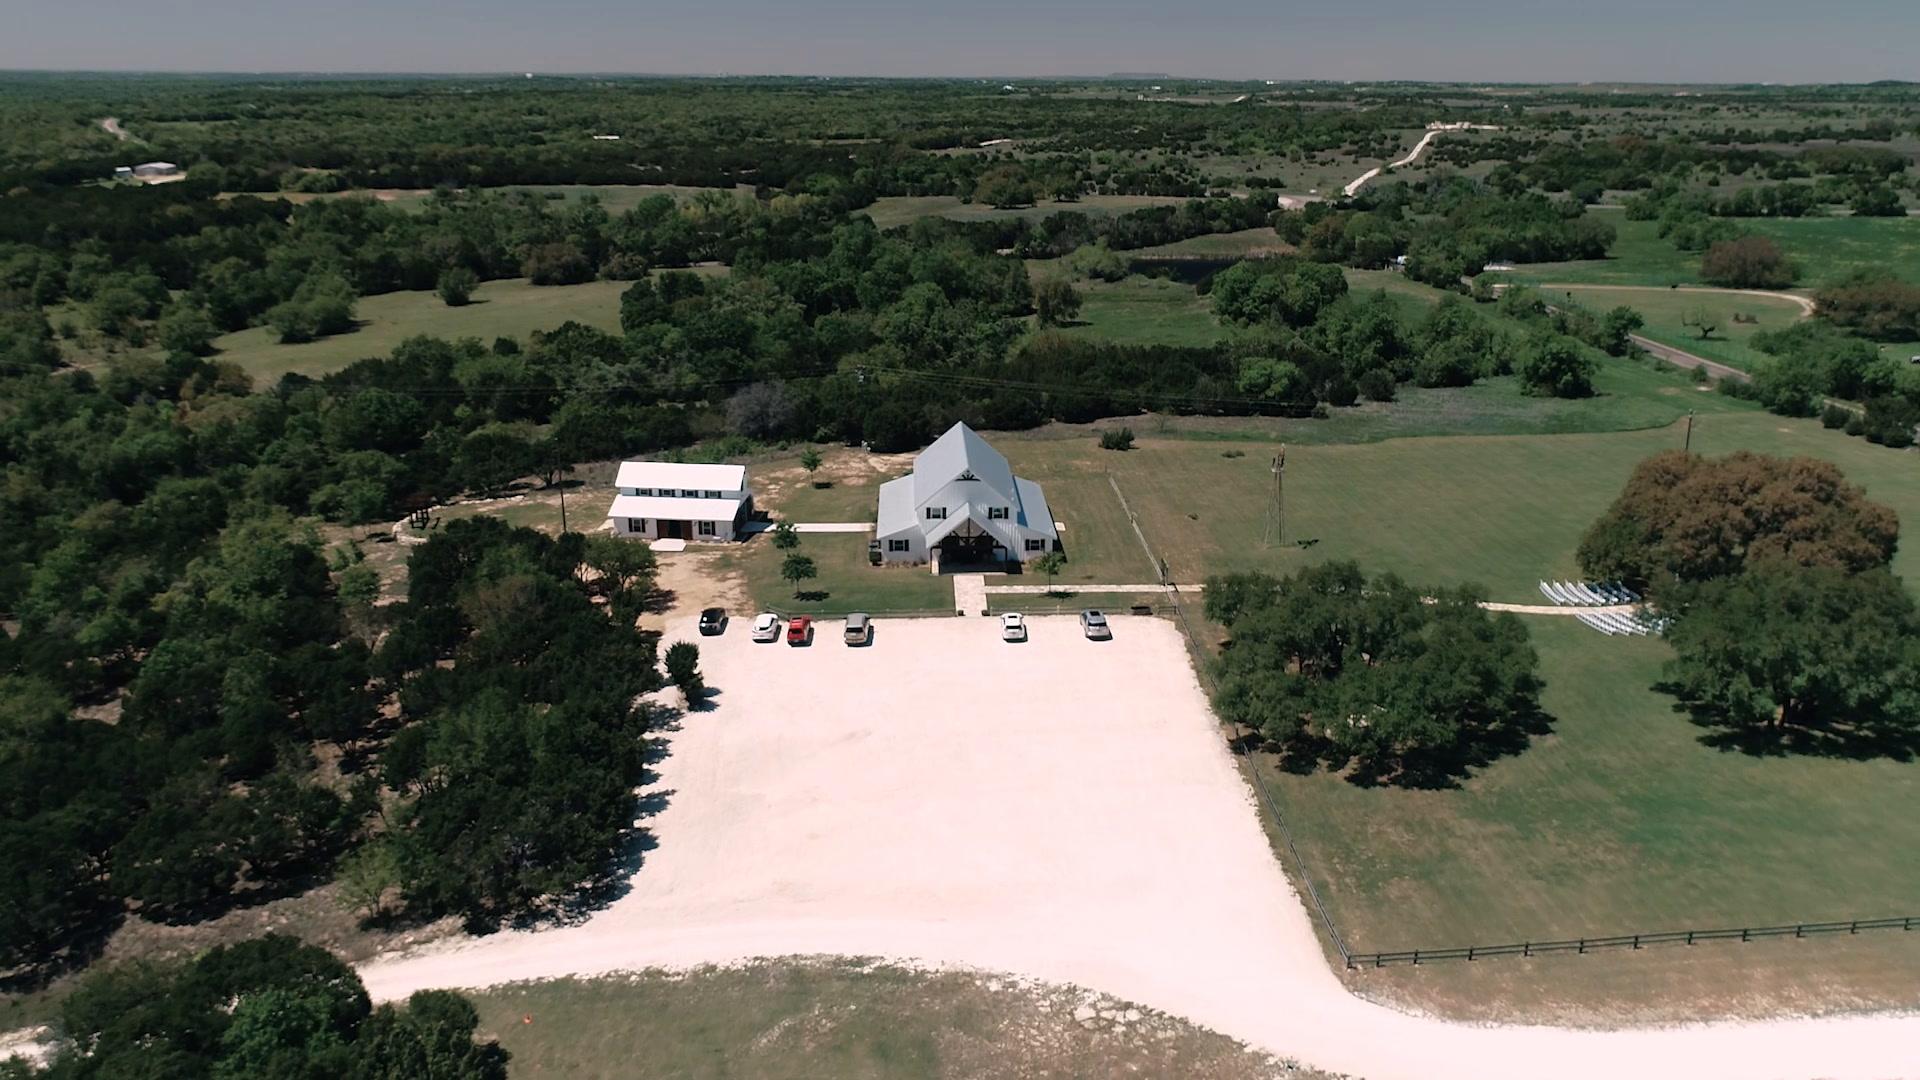 Kaylee + Joe | Cleburne, Texas | Five Oaks Farm